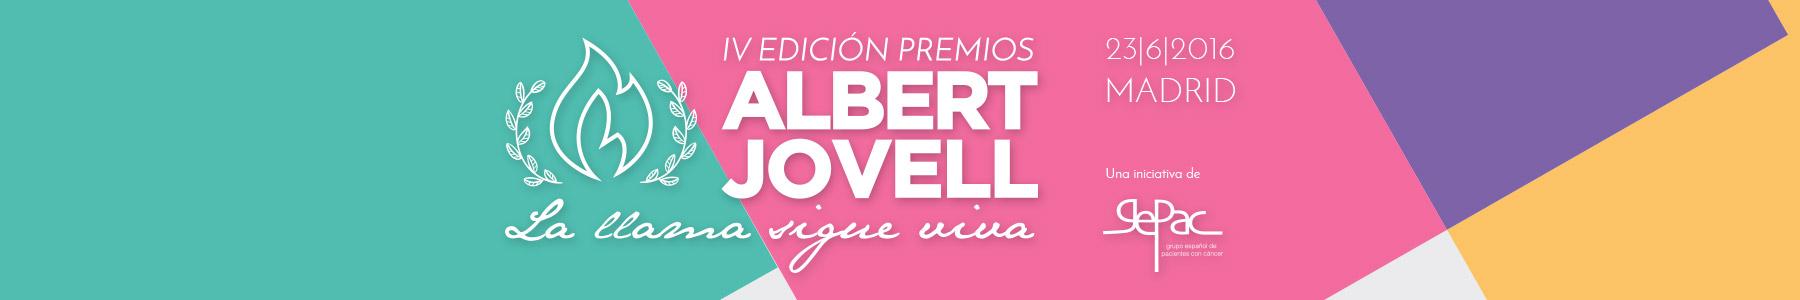 cabecera-web-aeal-IV-premios-albert-jovell